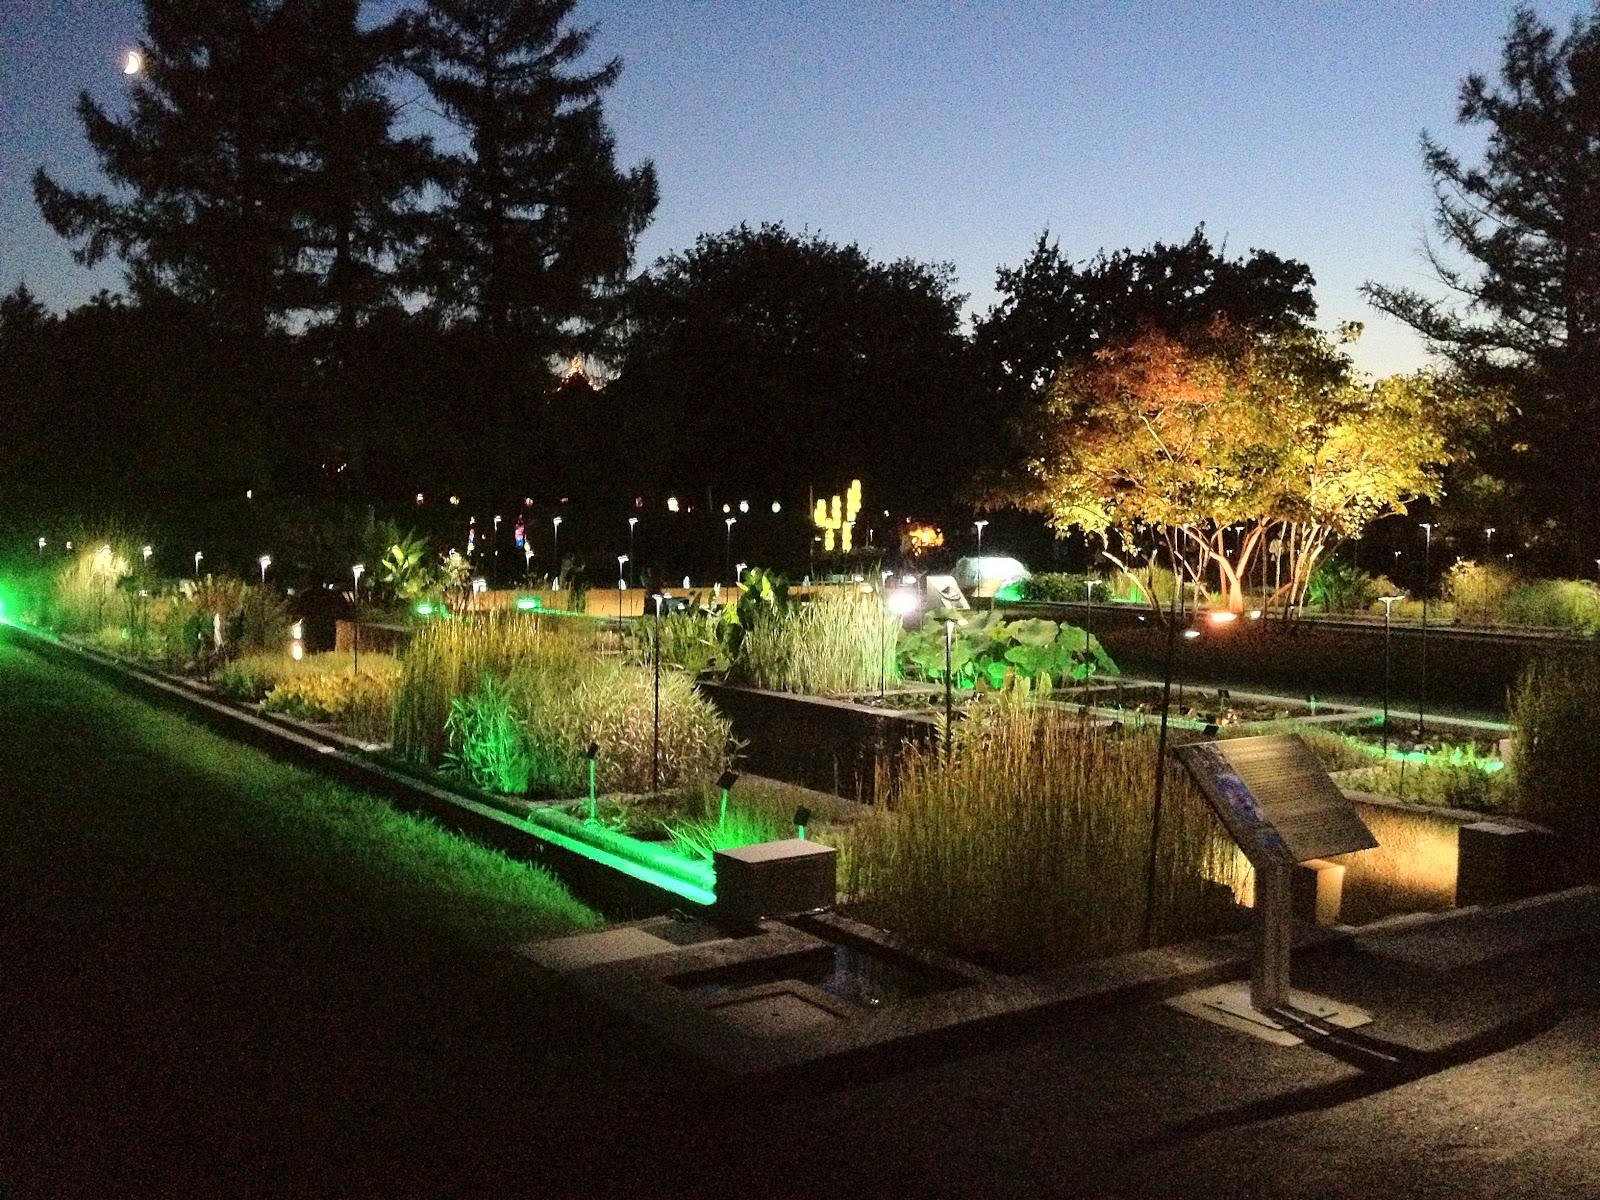 Jardin de lumi¨res Jardin Botanique